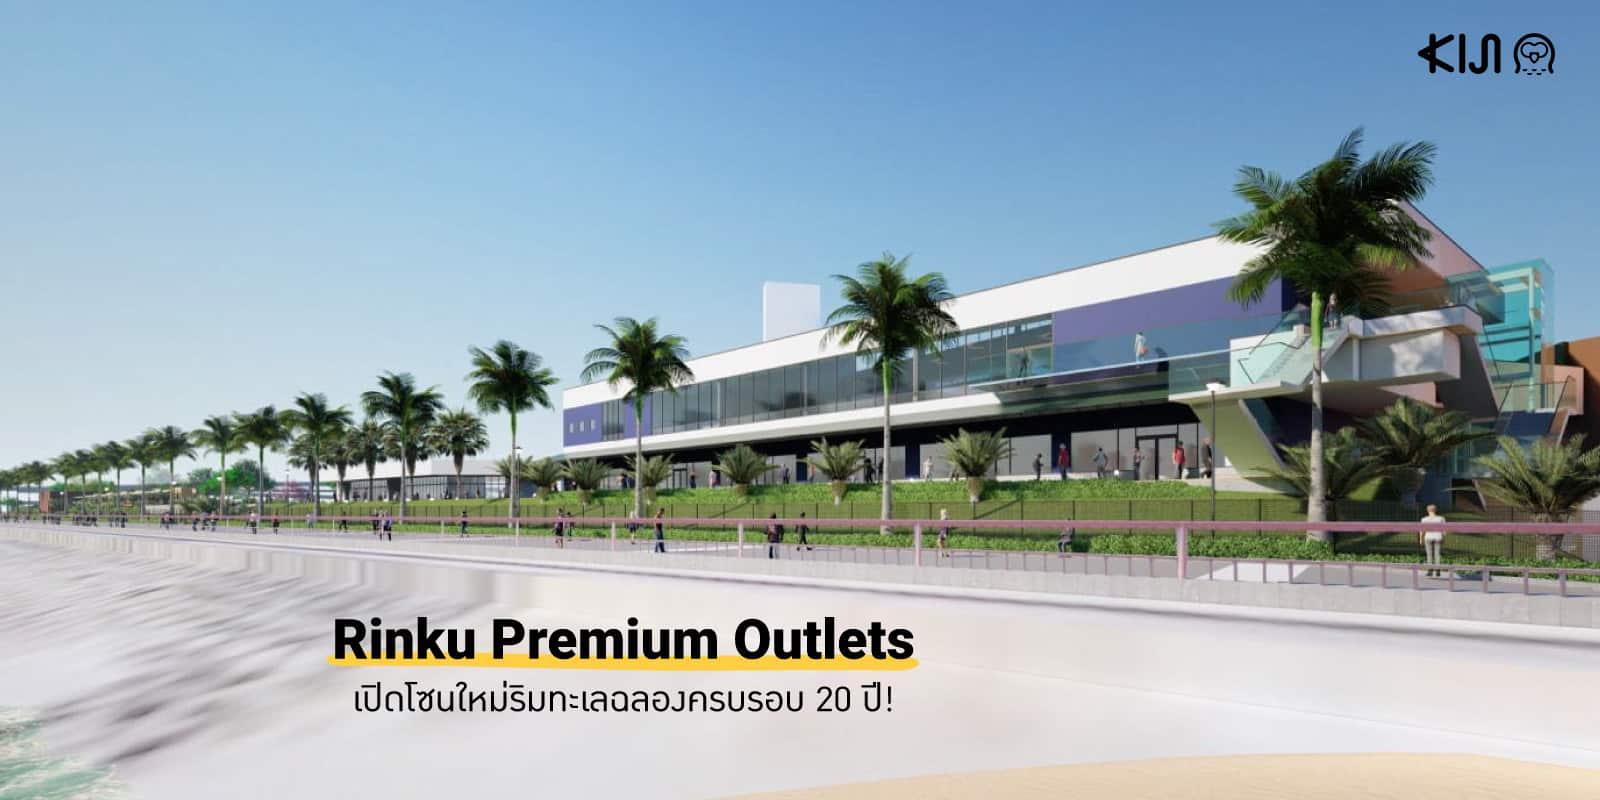 Rinku Premium Outlets เอาท์เล็ต โอซาก้า